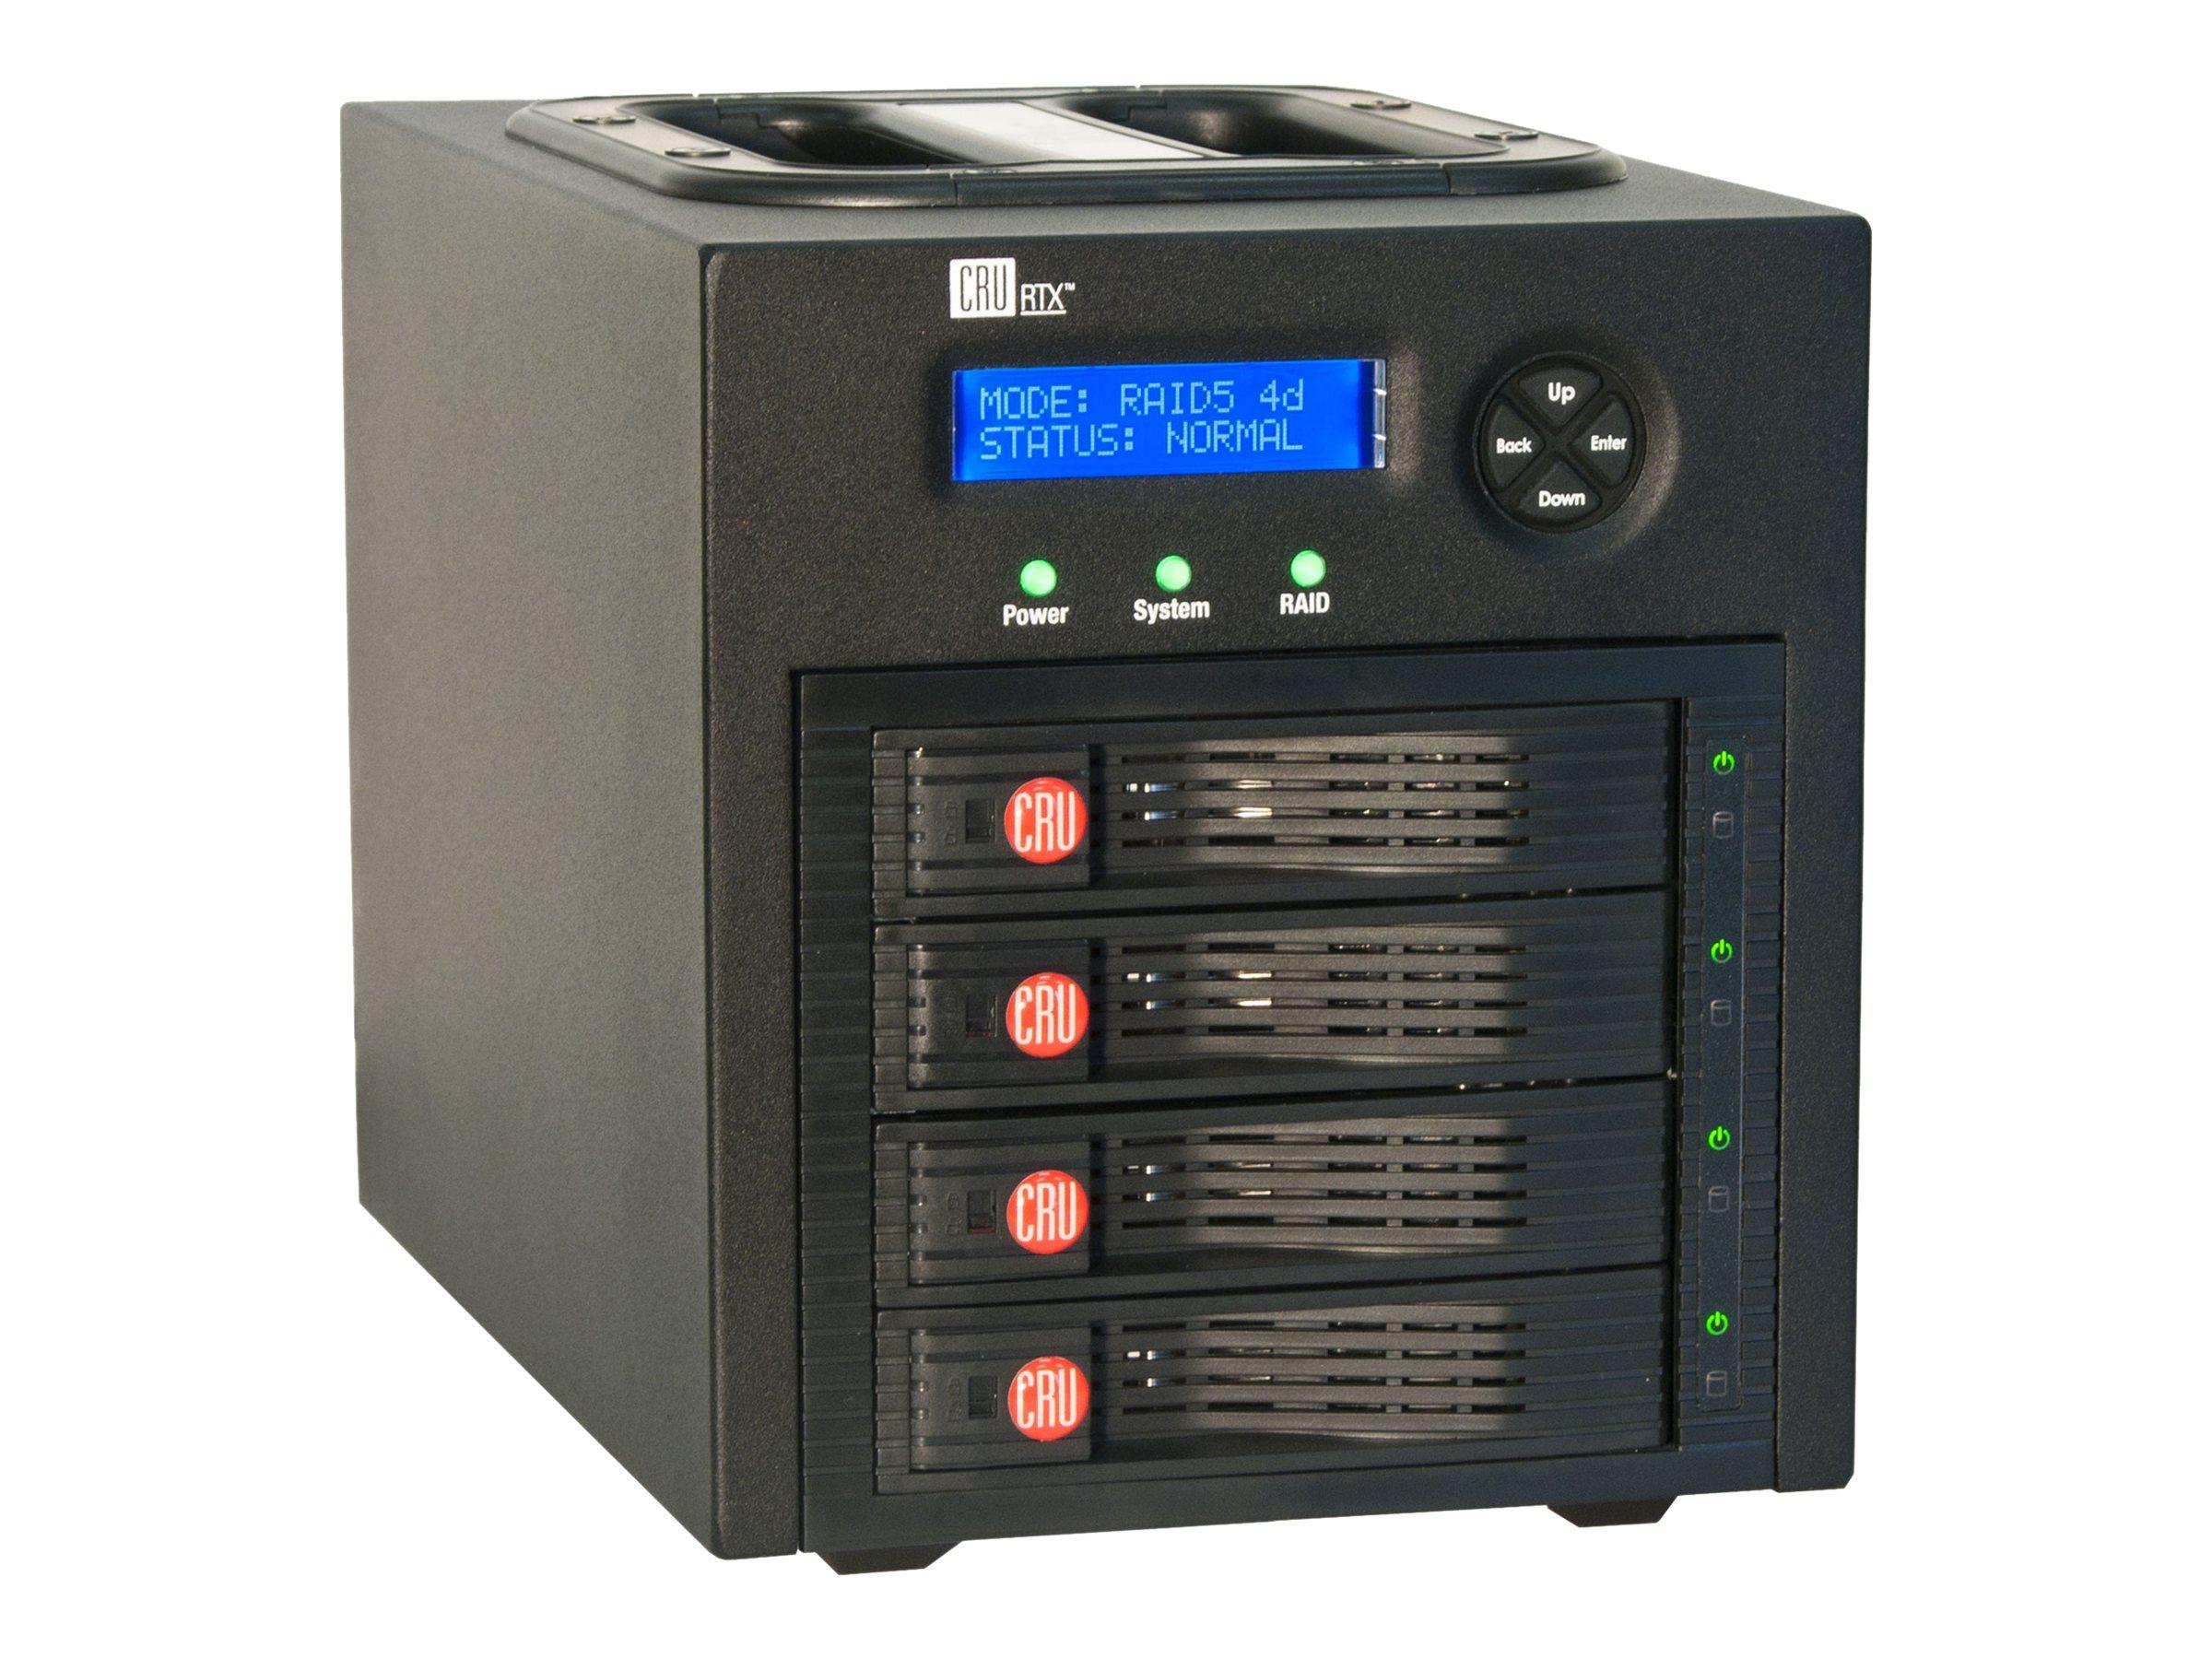 wiebeTECH RTX430-3QR 4 BAY RAID 4X2TB    PERPHFS+ USB3 ESATA FW800 ROHS